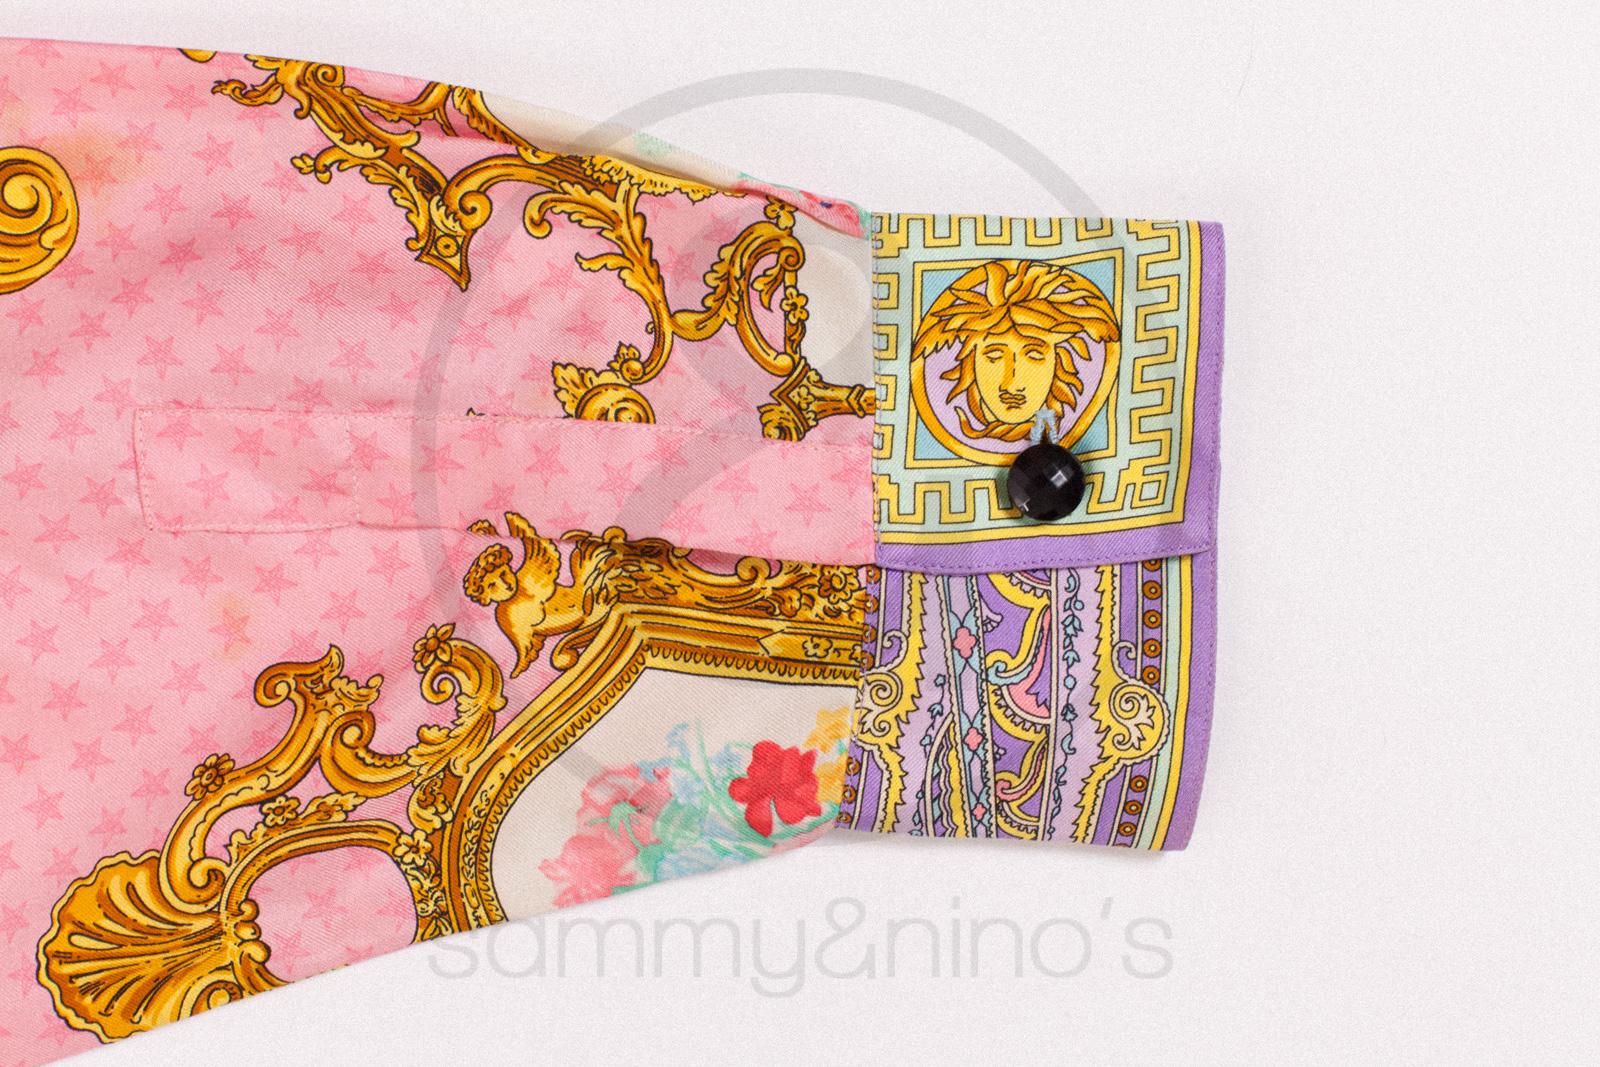 Gianni Versace Silk Shirt Sammy Ninos Store